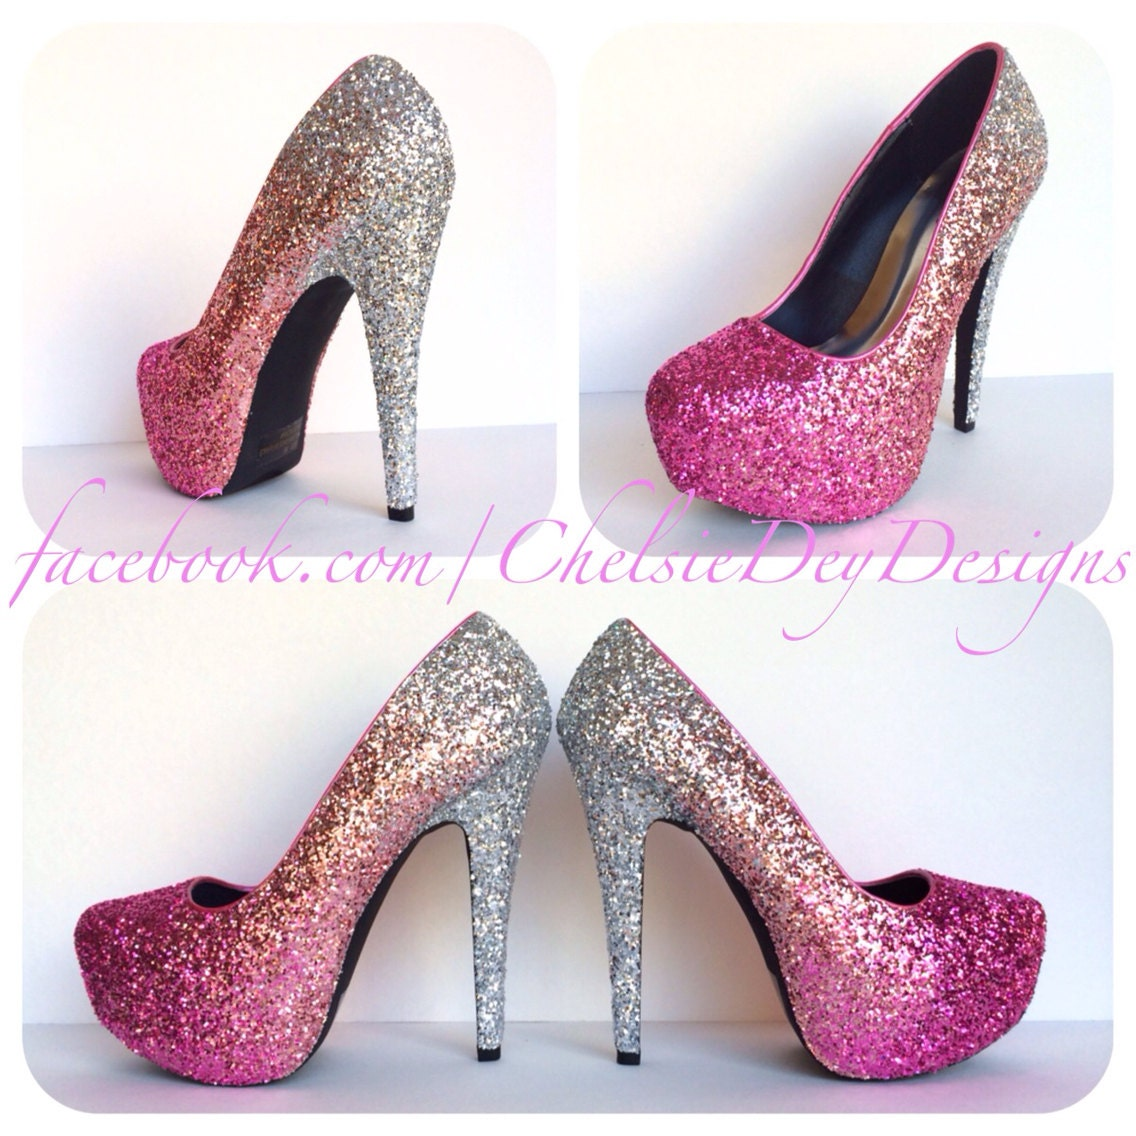 353f51ebf8e1 Glitter High Heels Hot Pink Pumps Light Pink Silver Ombre | Etsy